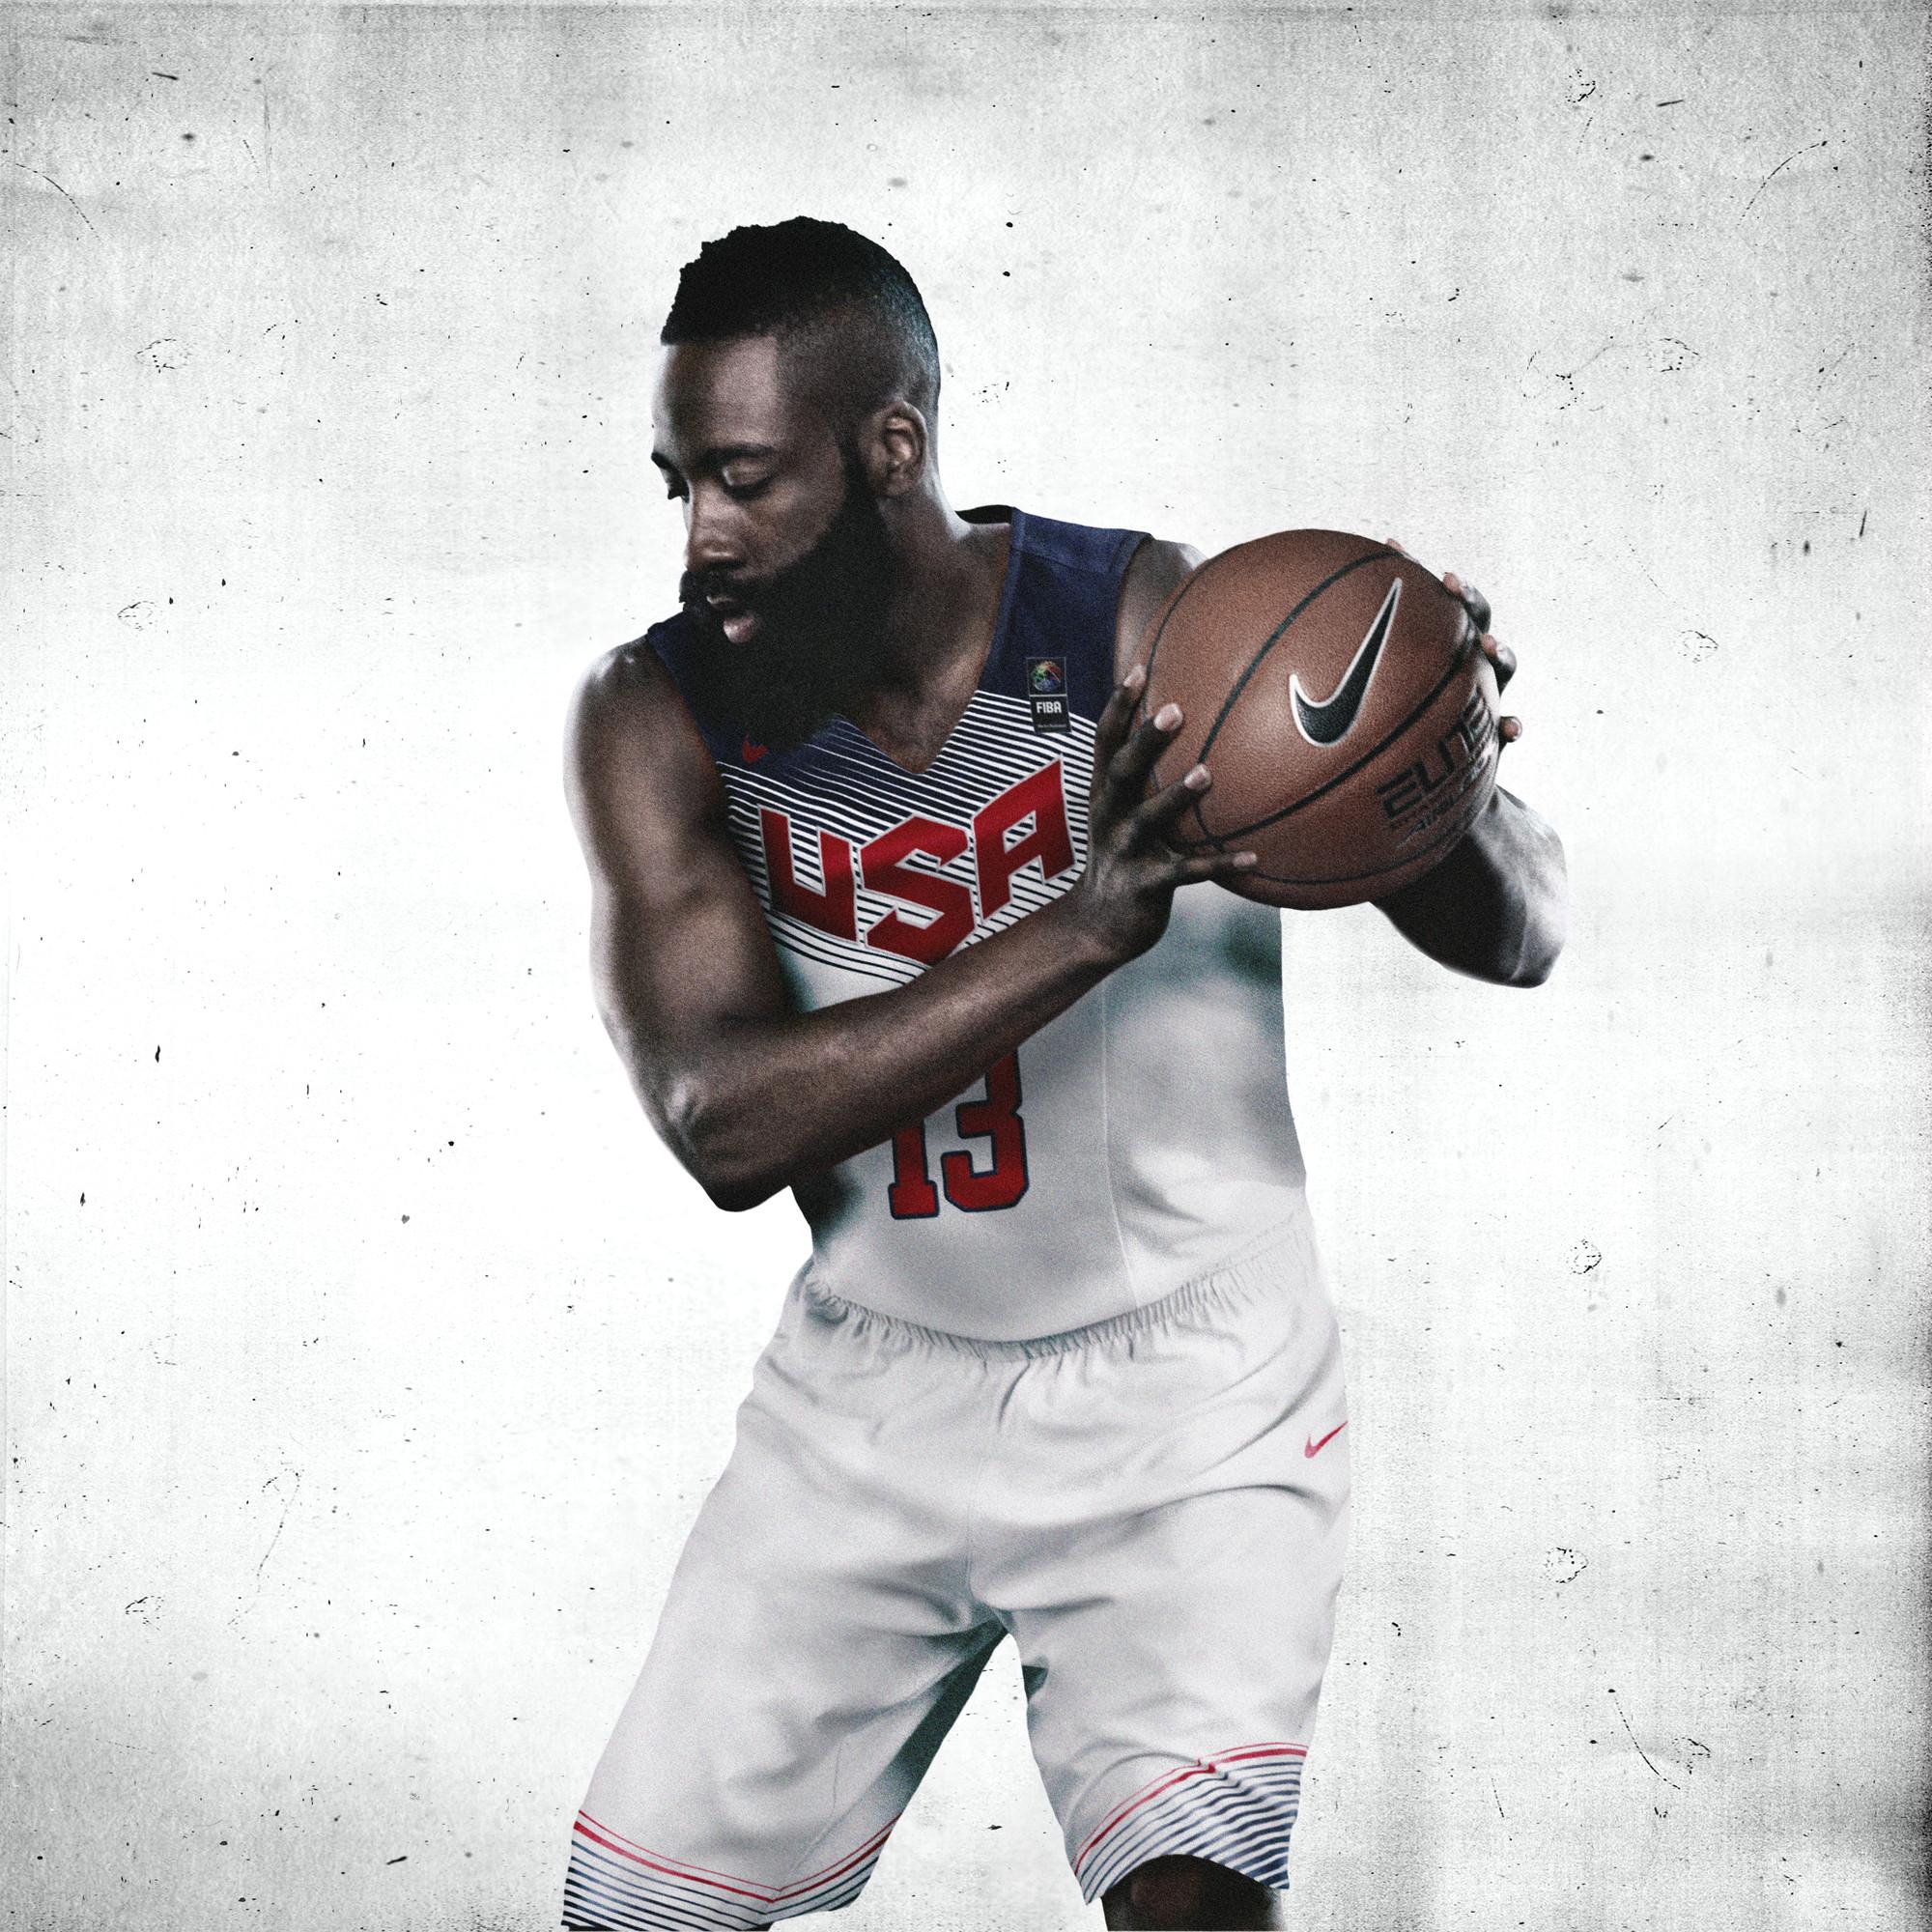 nike cite pour les femmes - Nike News - Nike Basketball Unveils USA Basketball Uniform